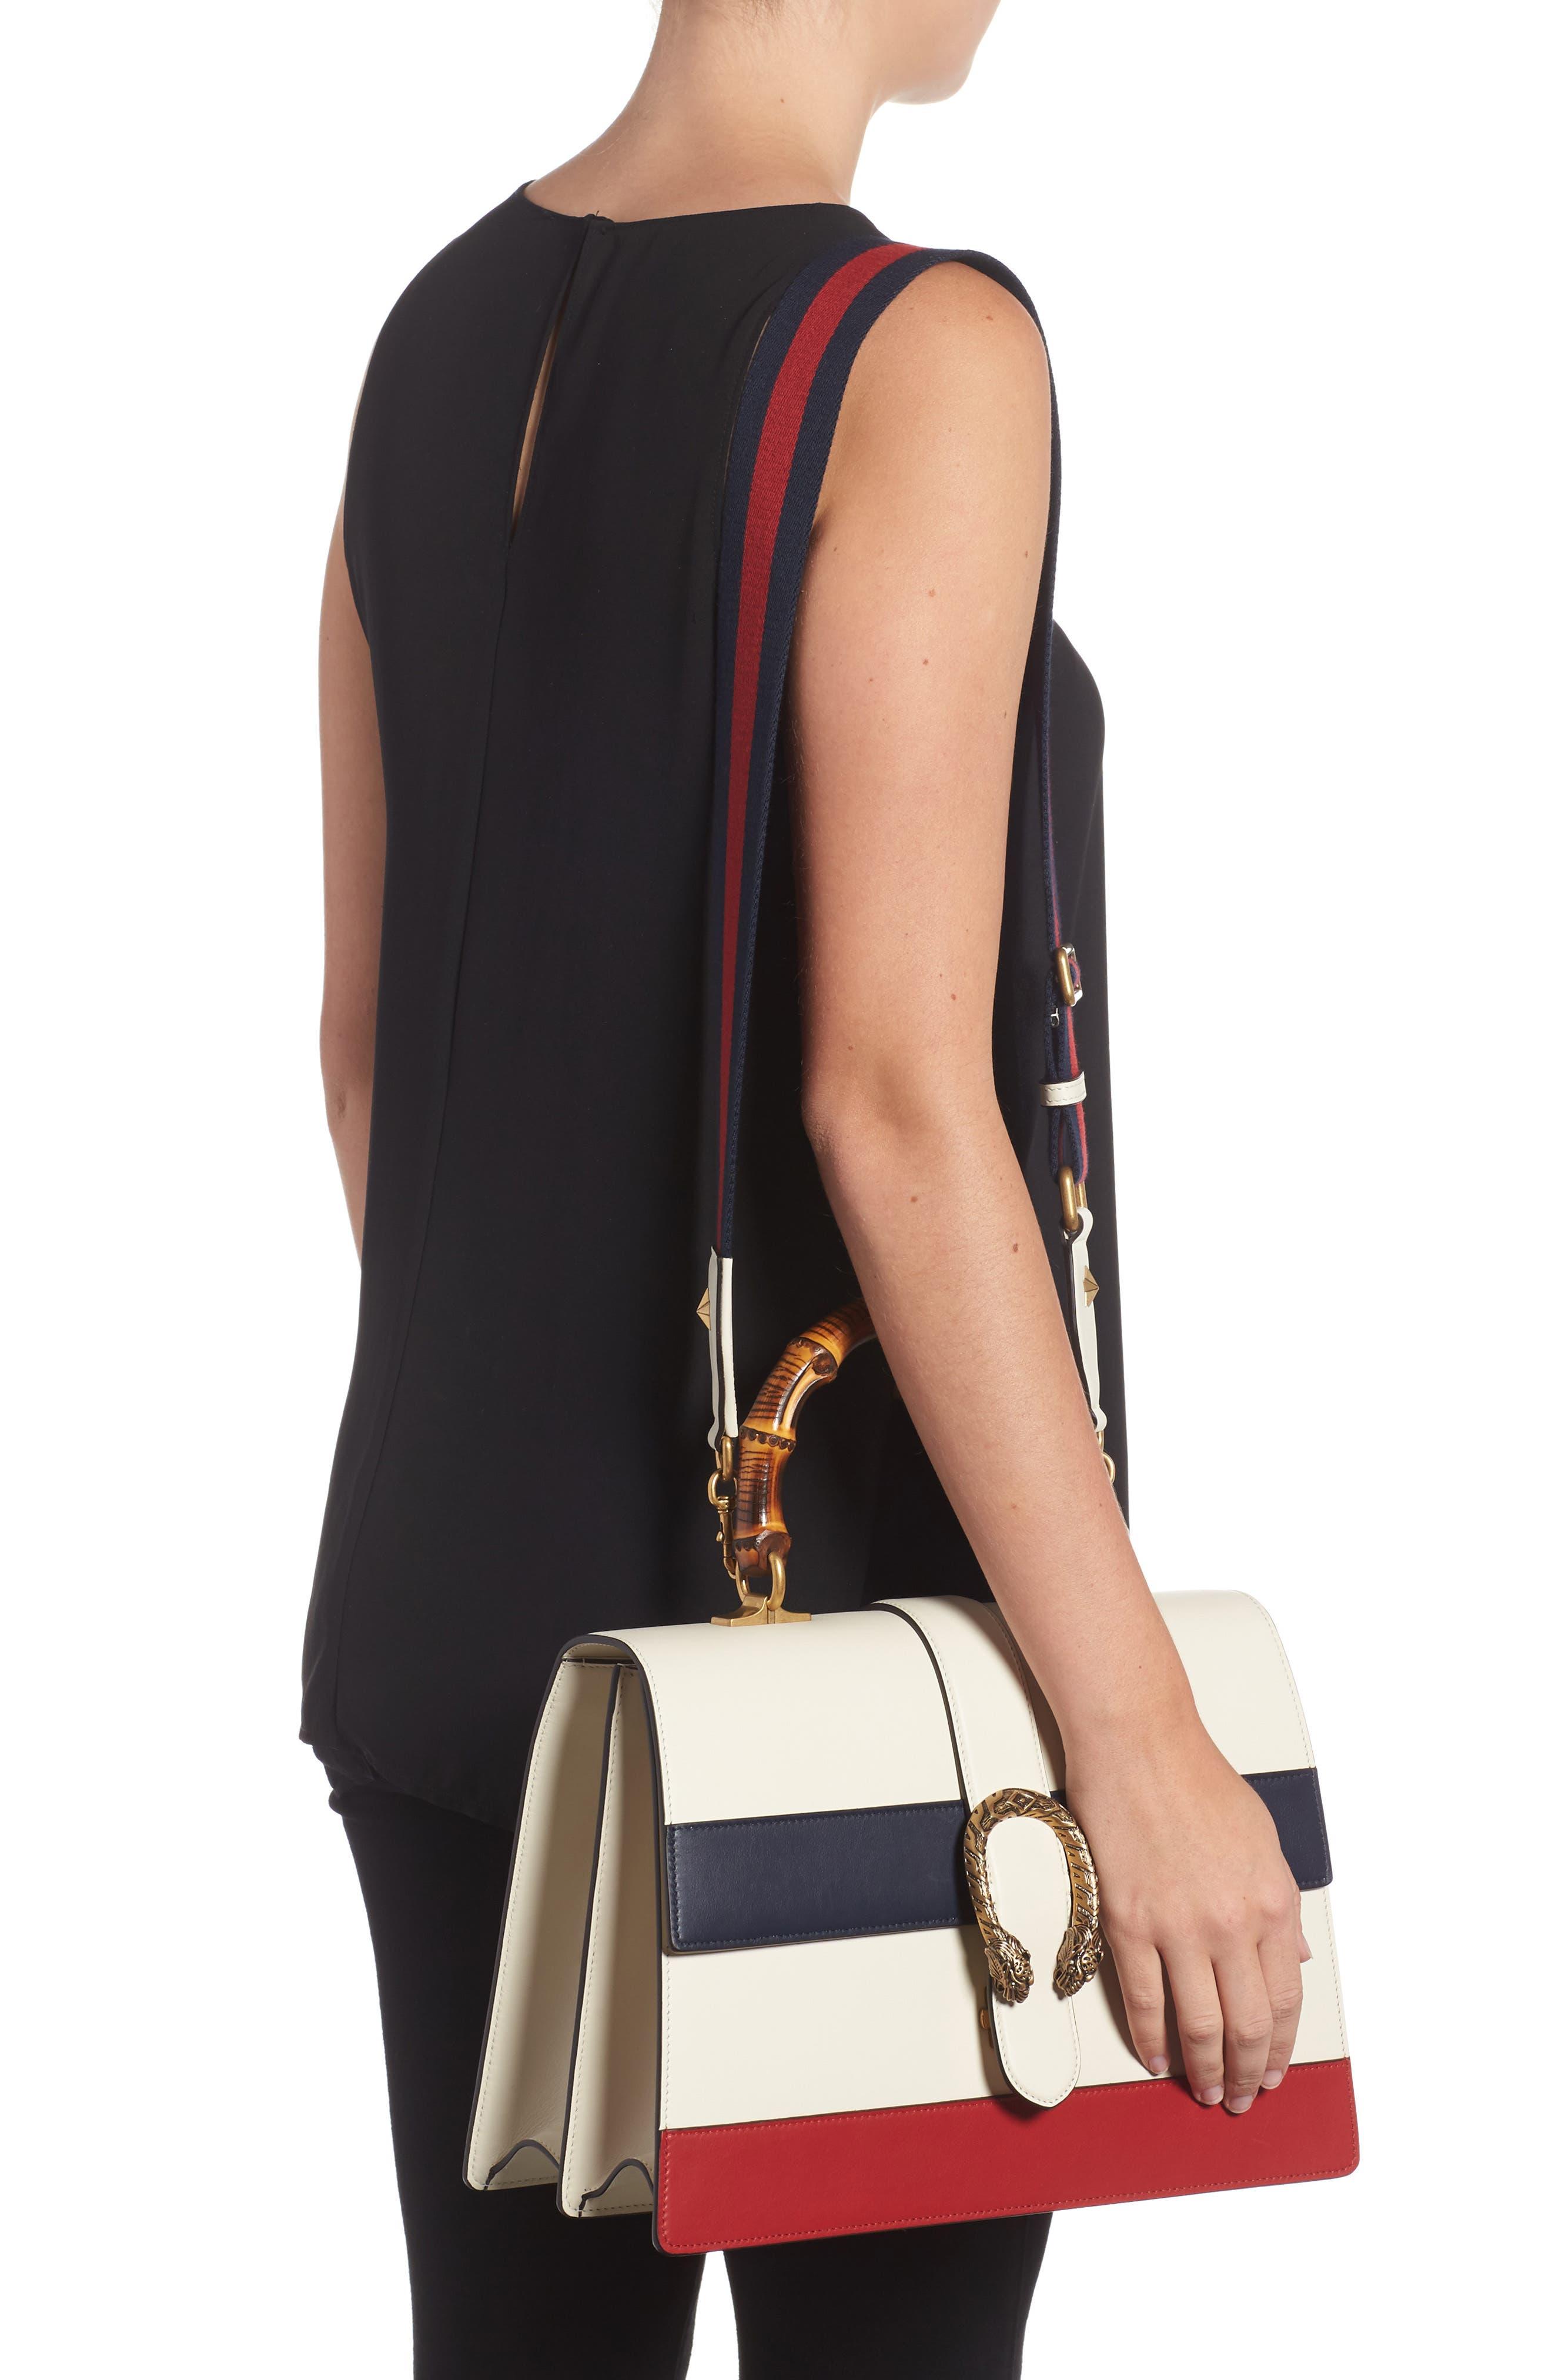 Large Dionysus Top Handle Leather Shoulder Bag,                             Alternate thumbnail 2, color,                             MYSTIC WHITE/ BLUE/ RED